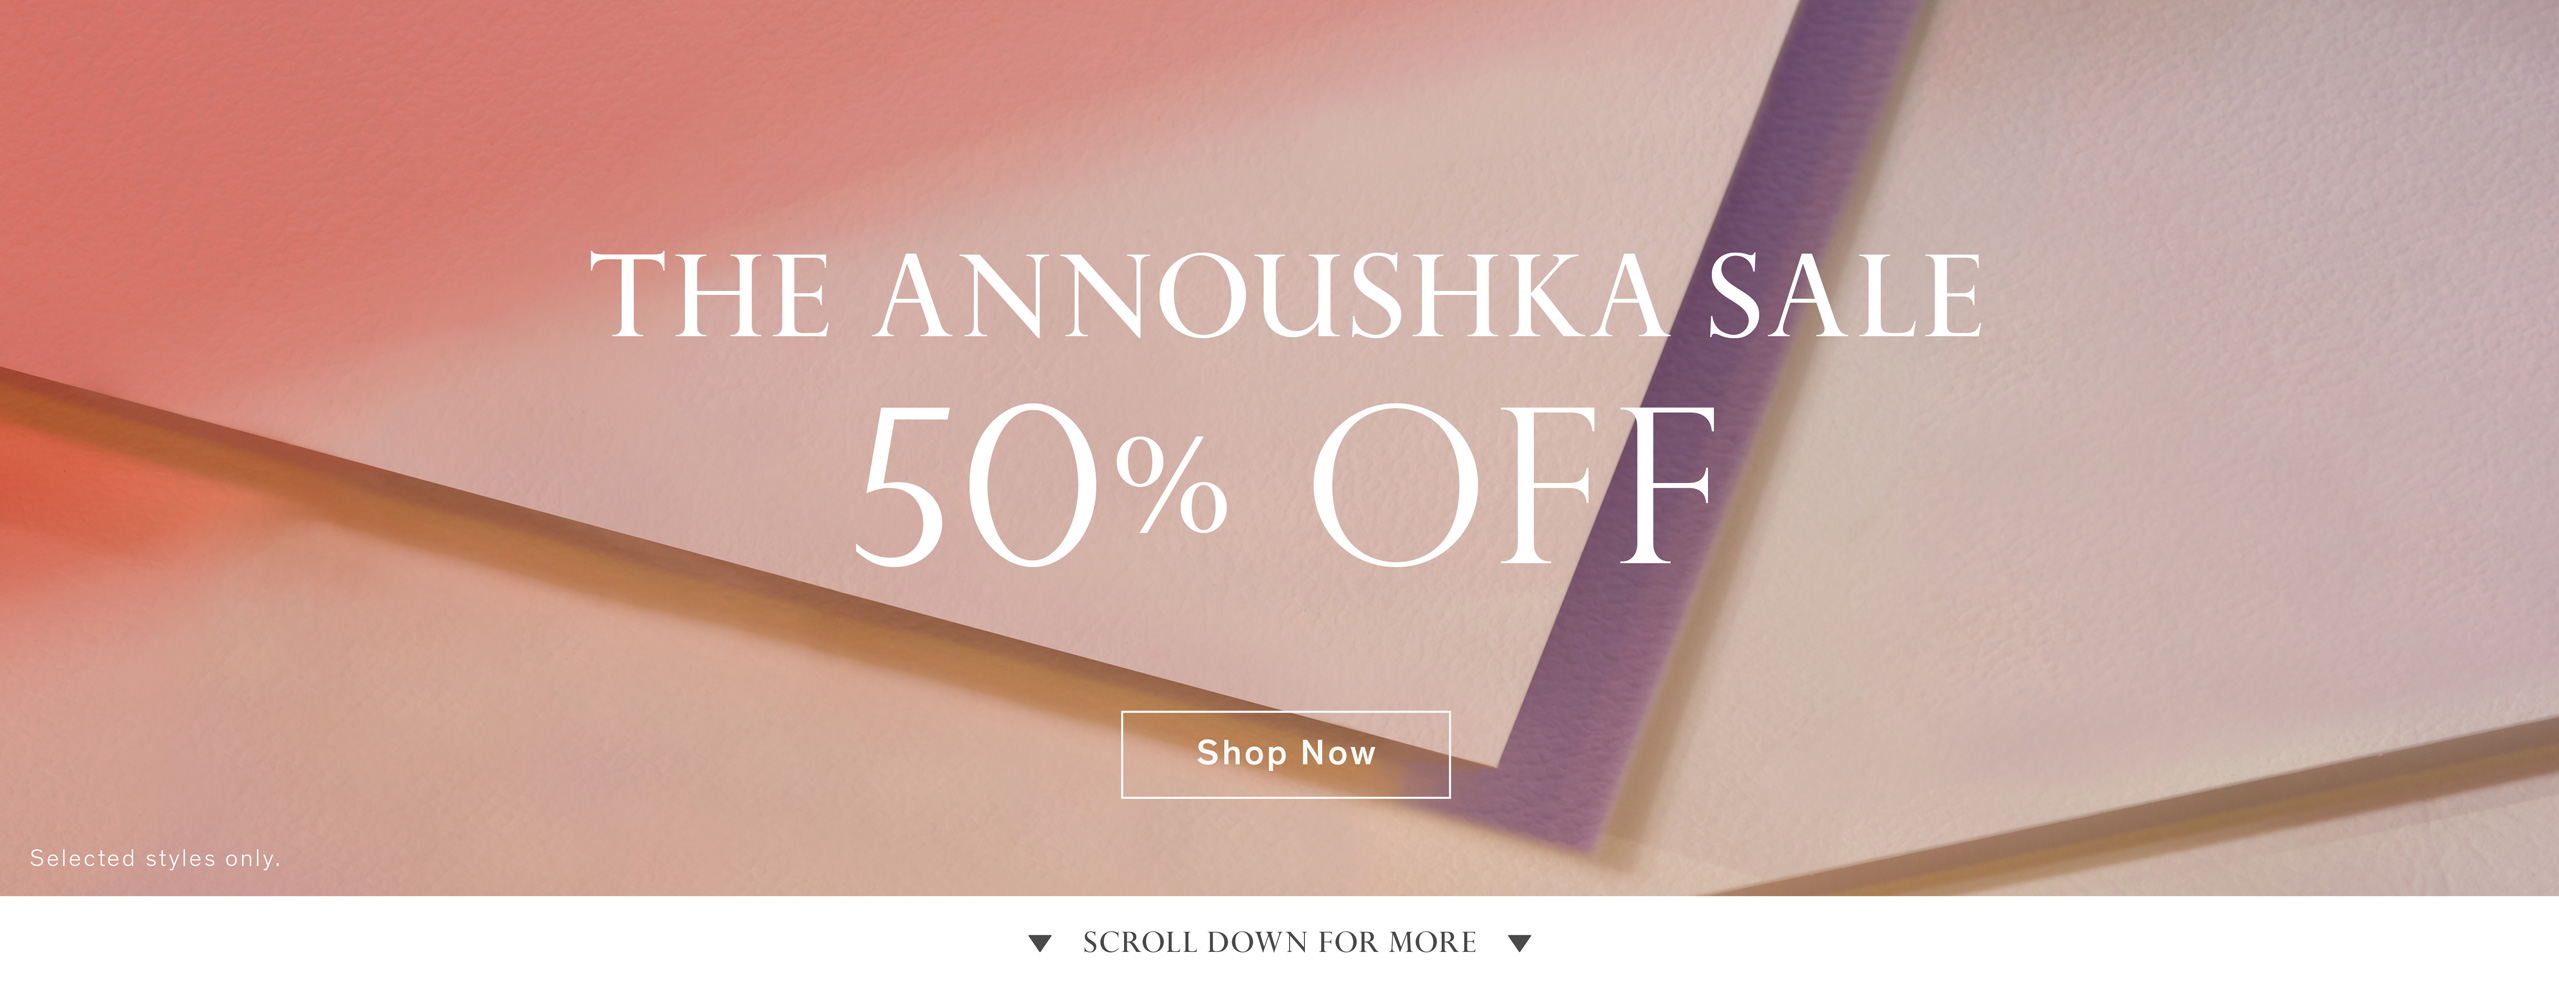 Annoushka Sale